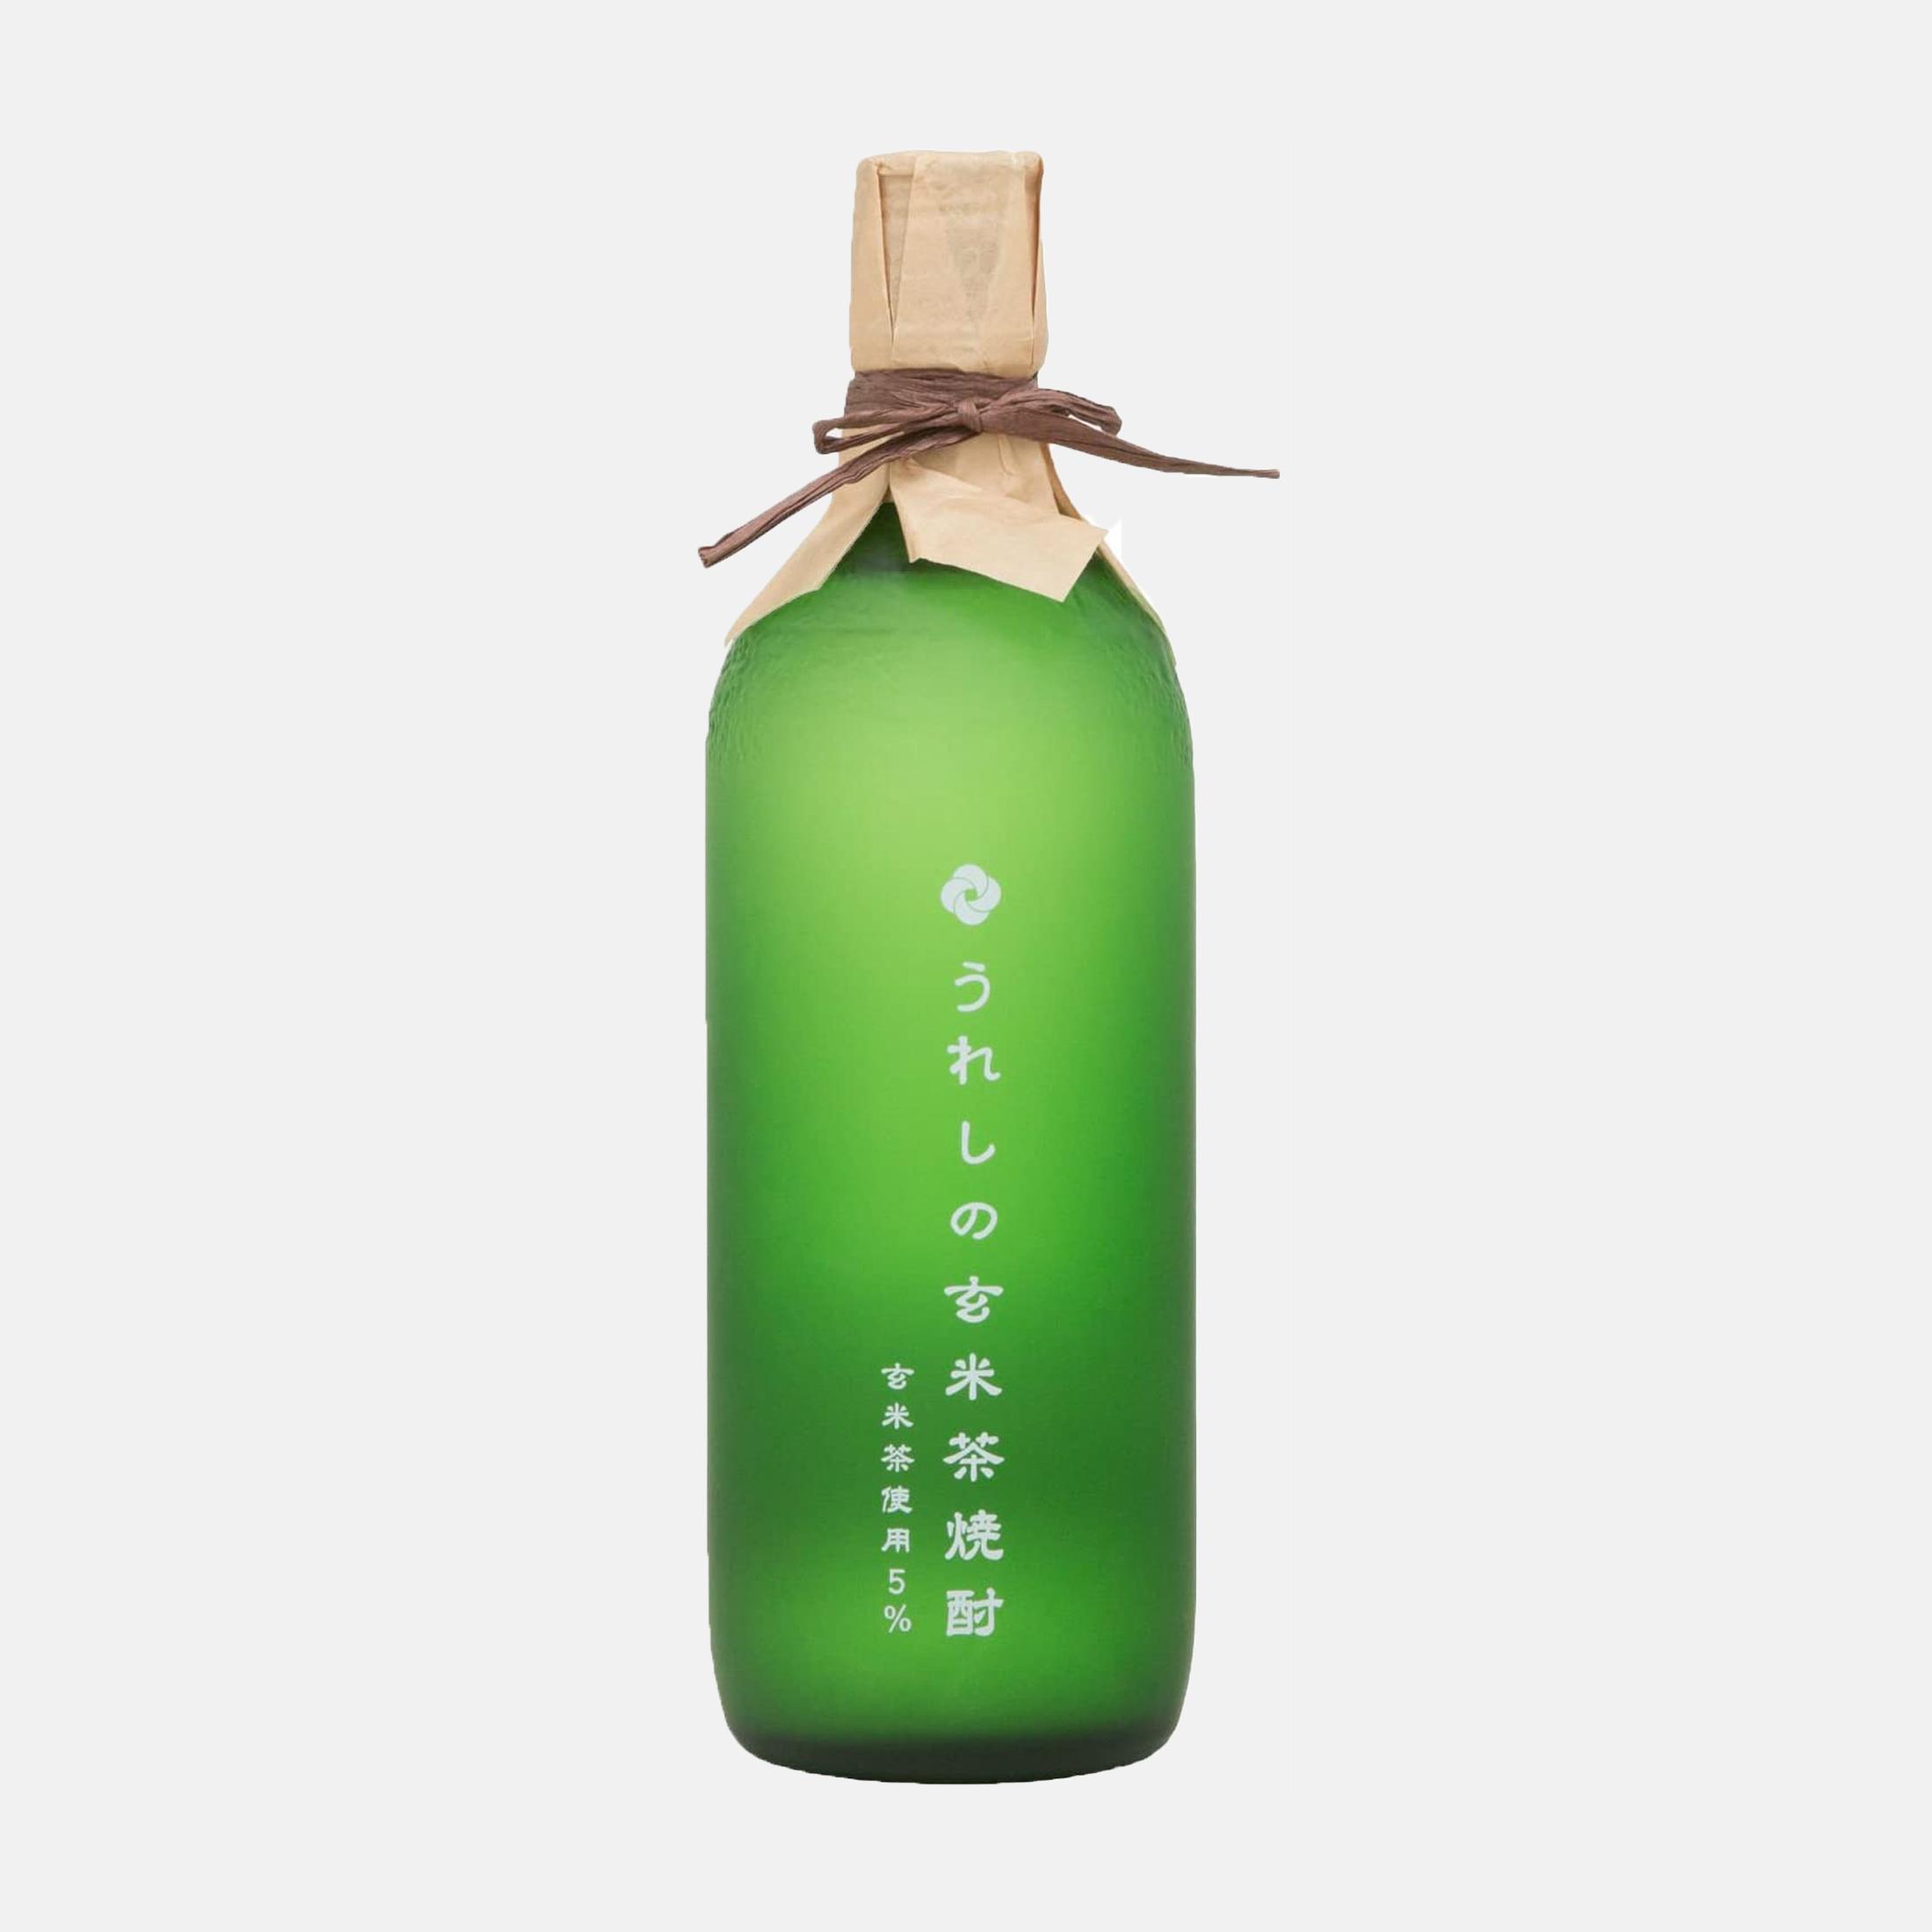 Ureshi No Genmaicha- Green Tea Shochu [720ml]